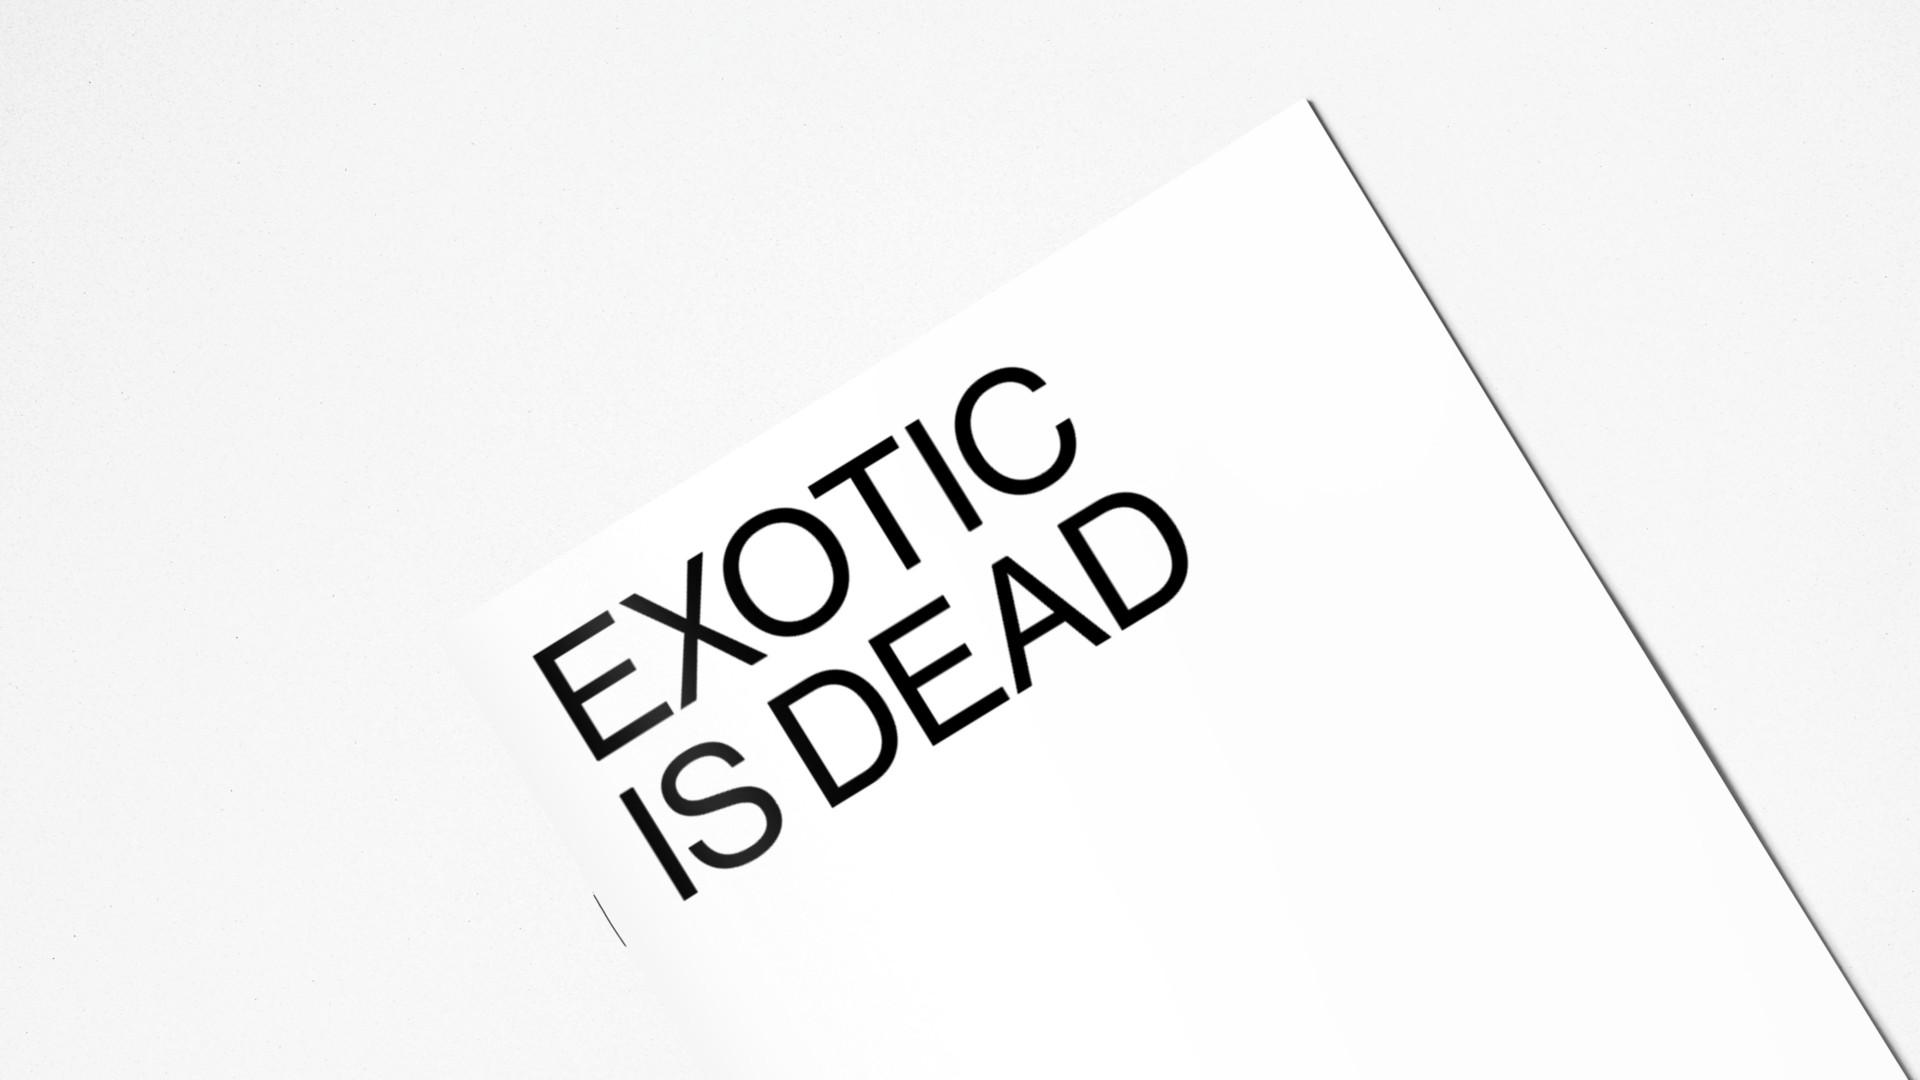 Alberto Fontana ↑   Exotic is dead